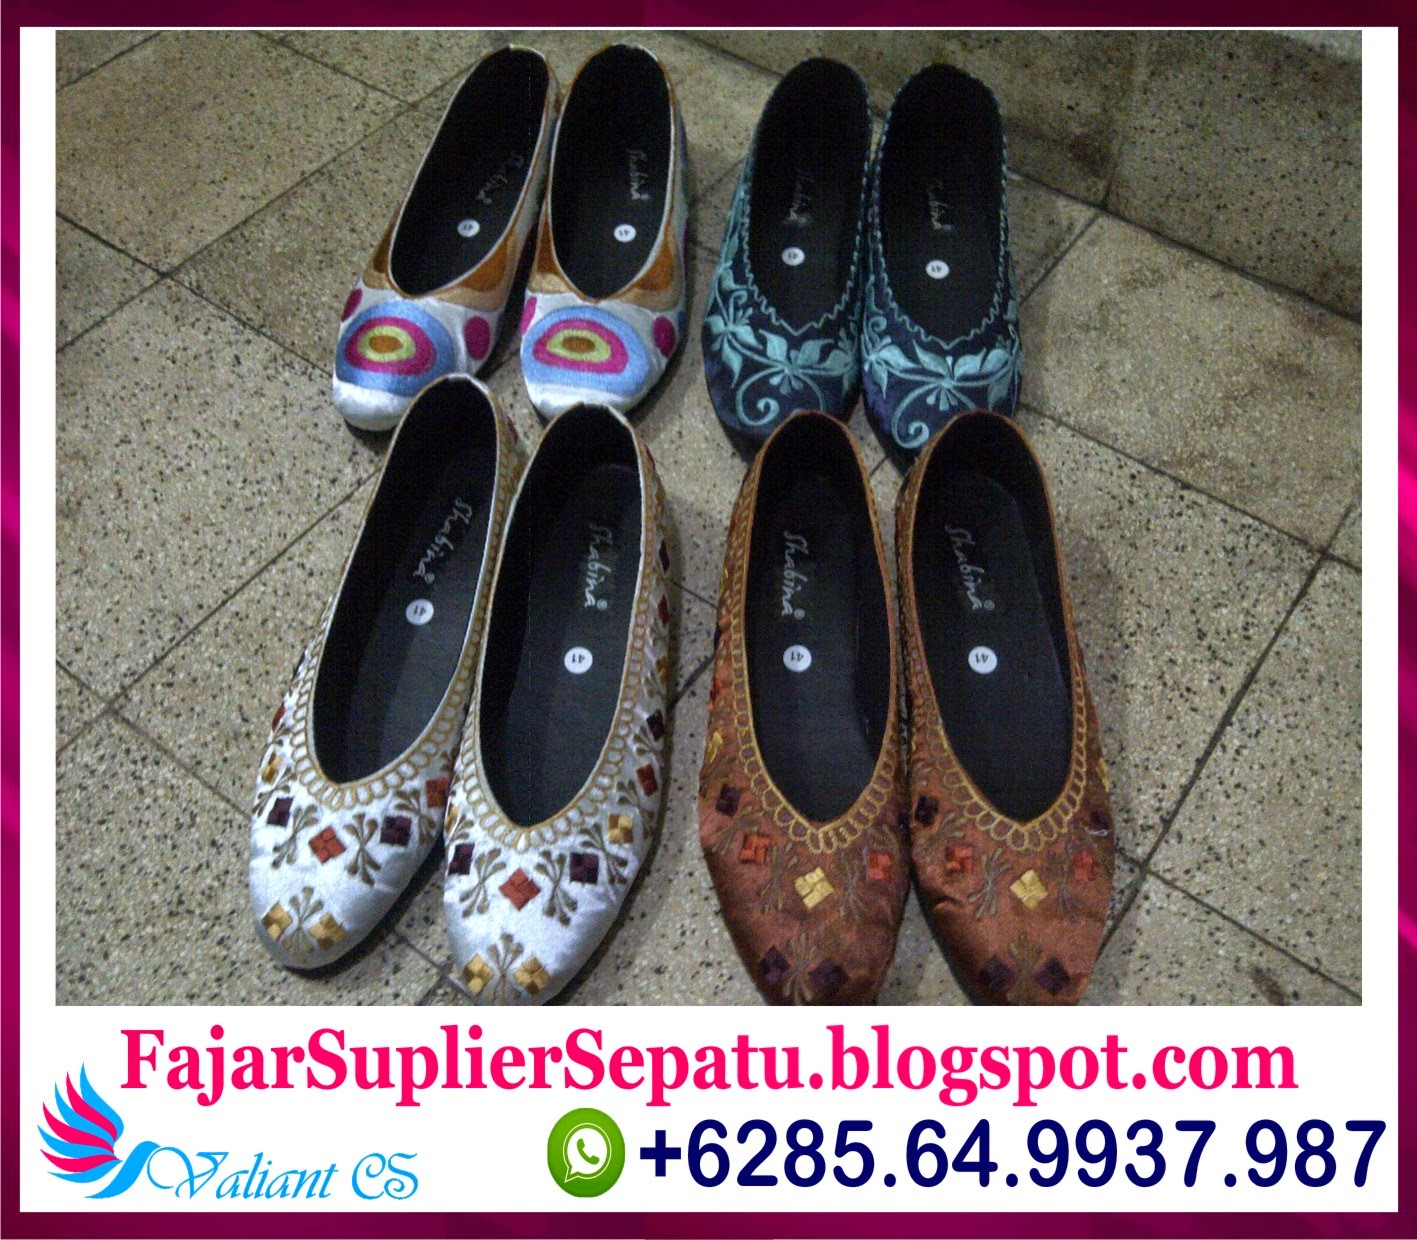 Sepatu Bordir Murah, Grosir Sepatu Bordir Jakarta, Jual Sepatu Bordir Murah, +62.8564.993.7987